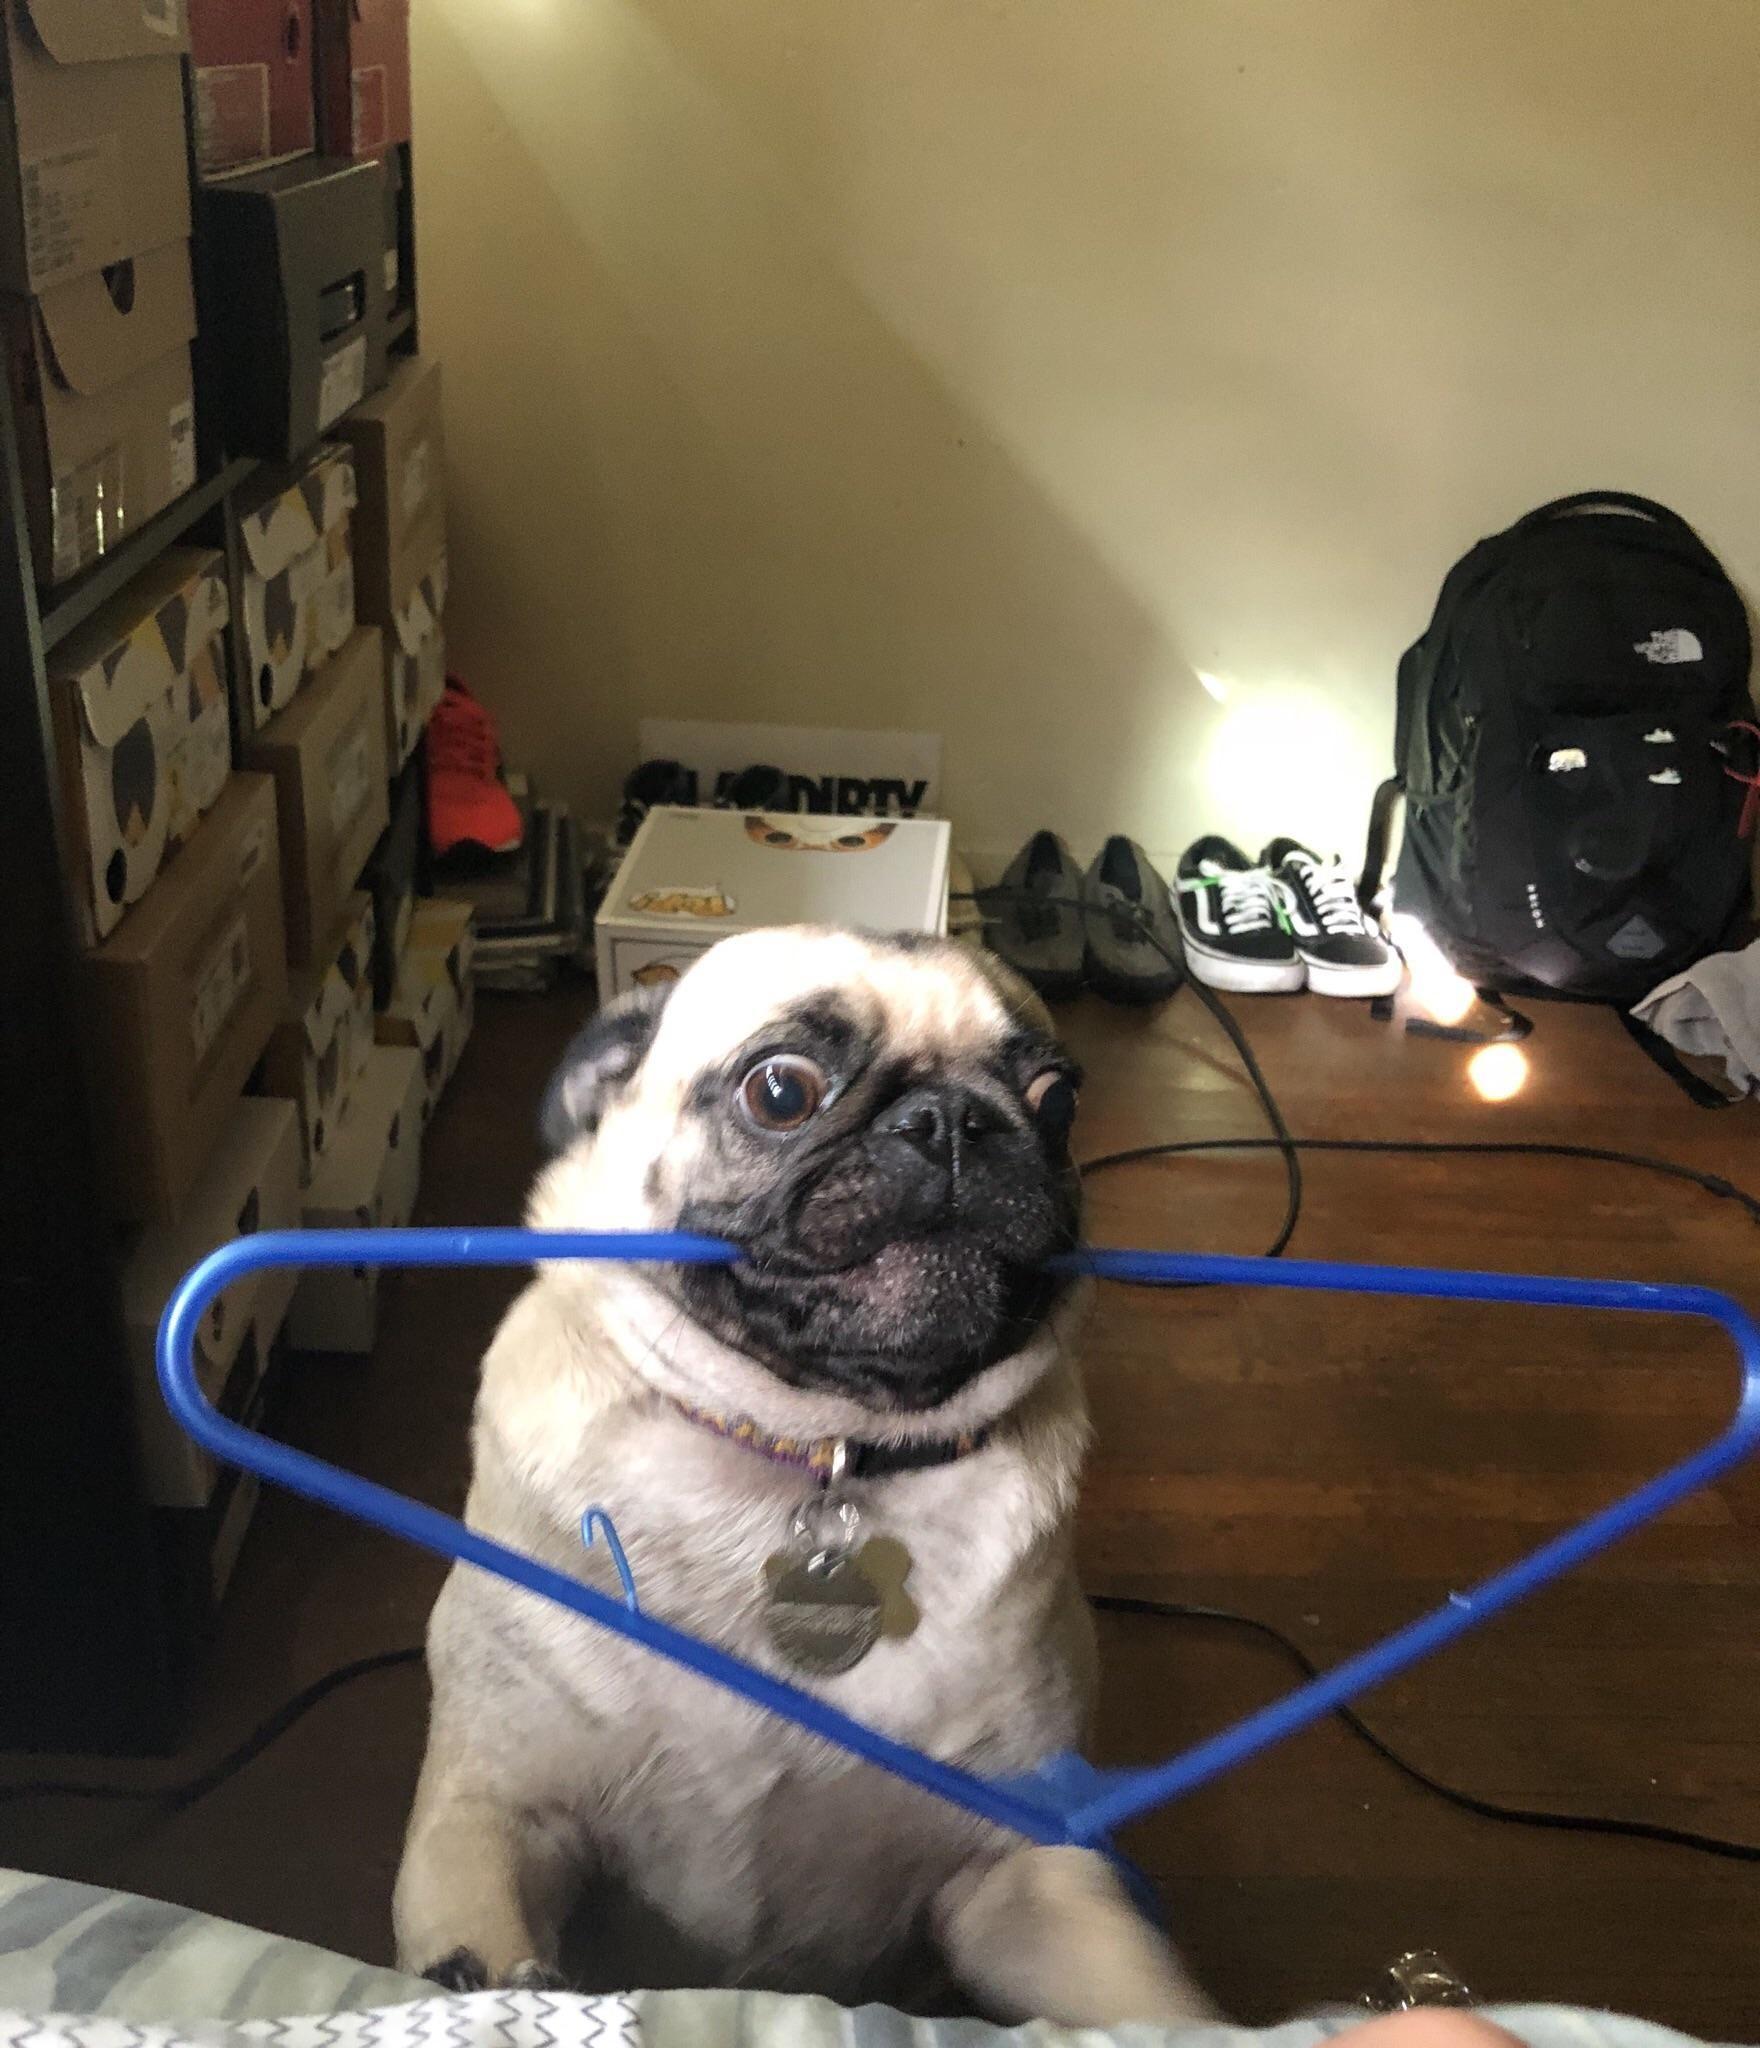 How I Got Woken Up This Morning Smart Dog Toys Cute Animals Pugs